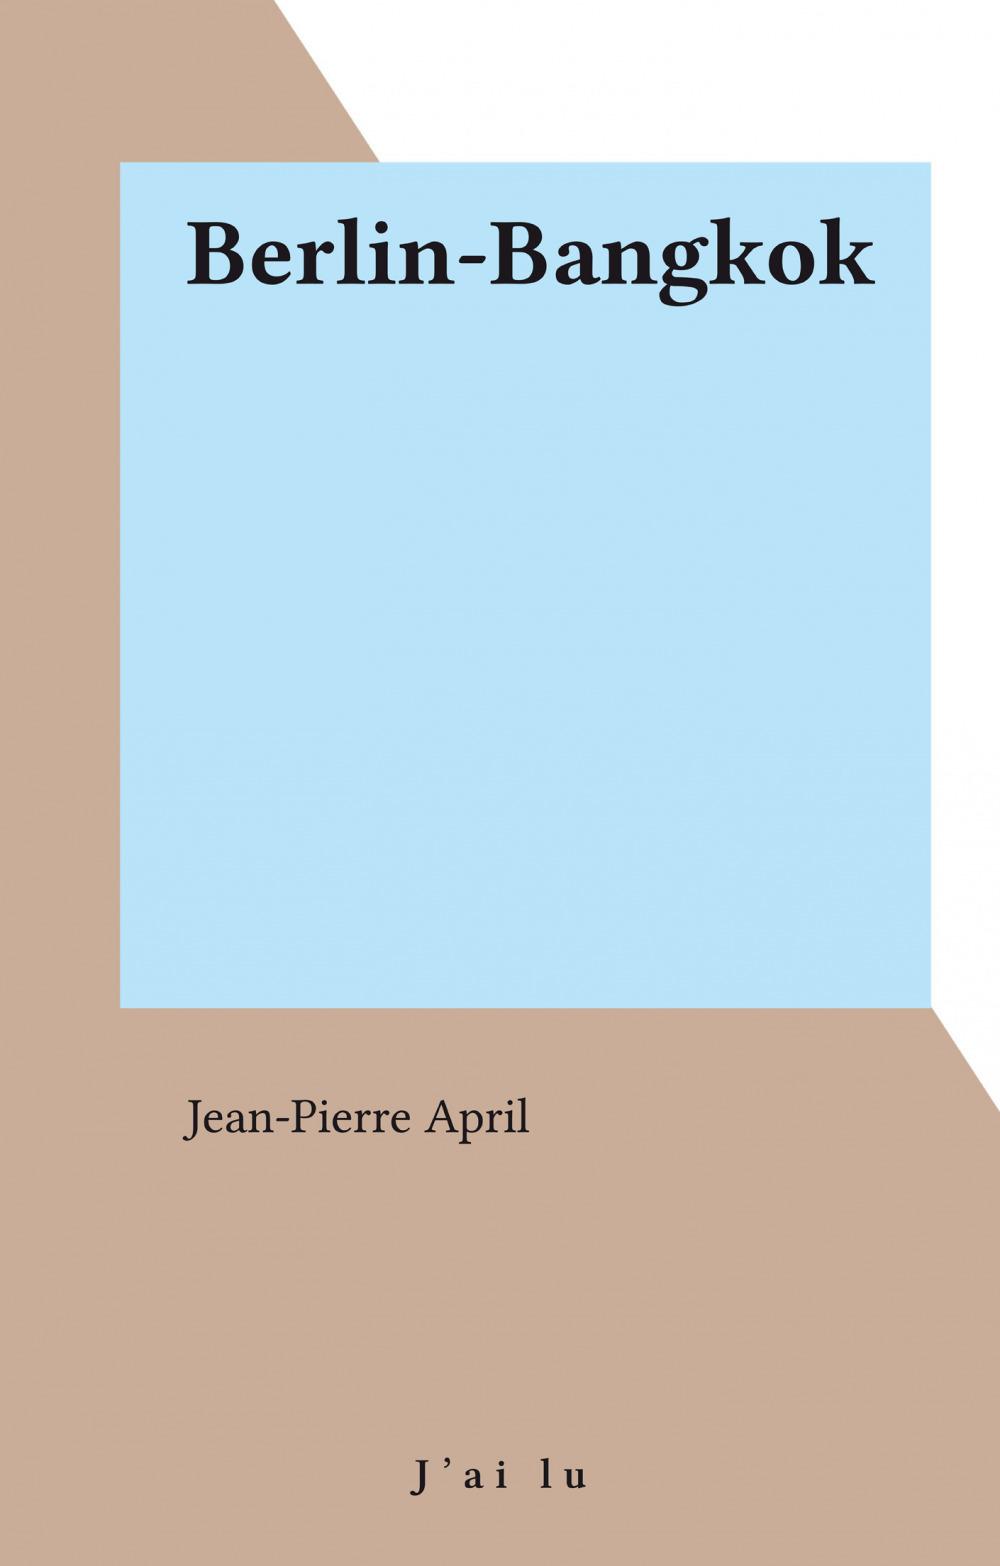 Berlin-Bangkok  - Jean-Pierre April